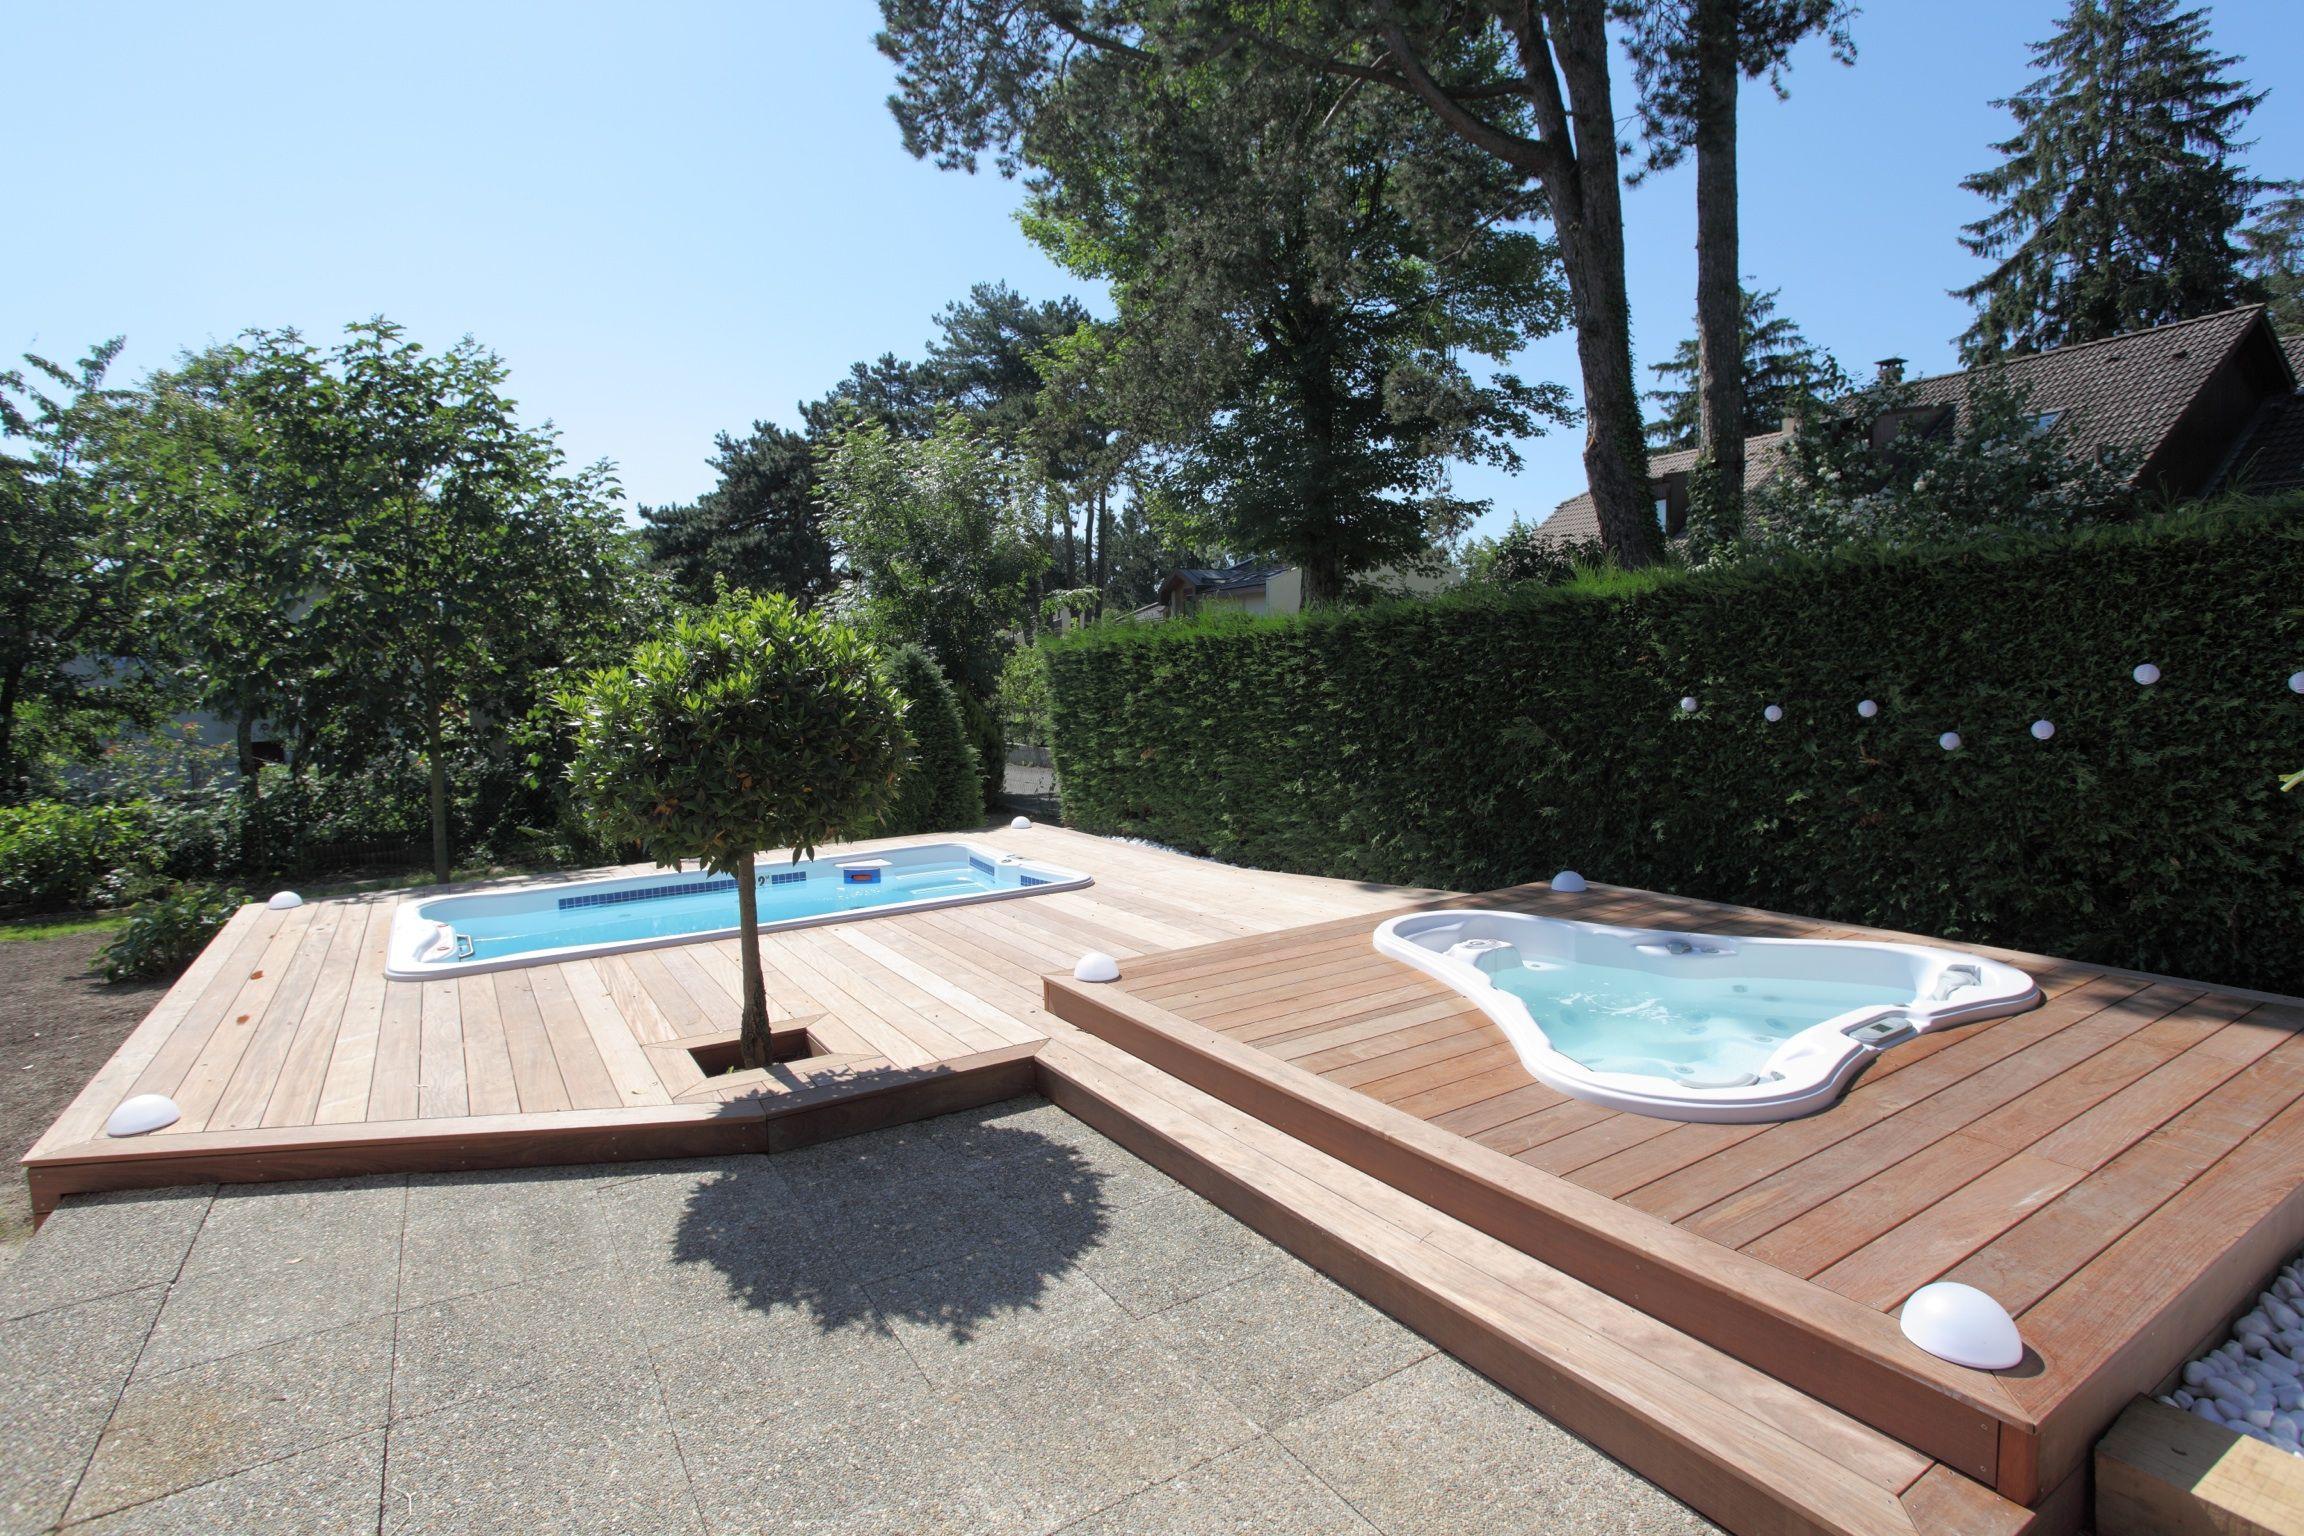 Dupree Bay Spa Pool Pool Swimming Pools